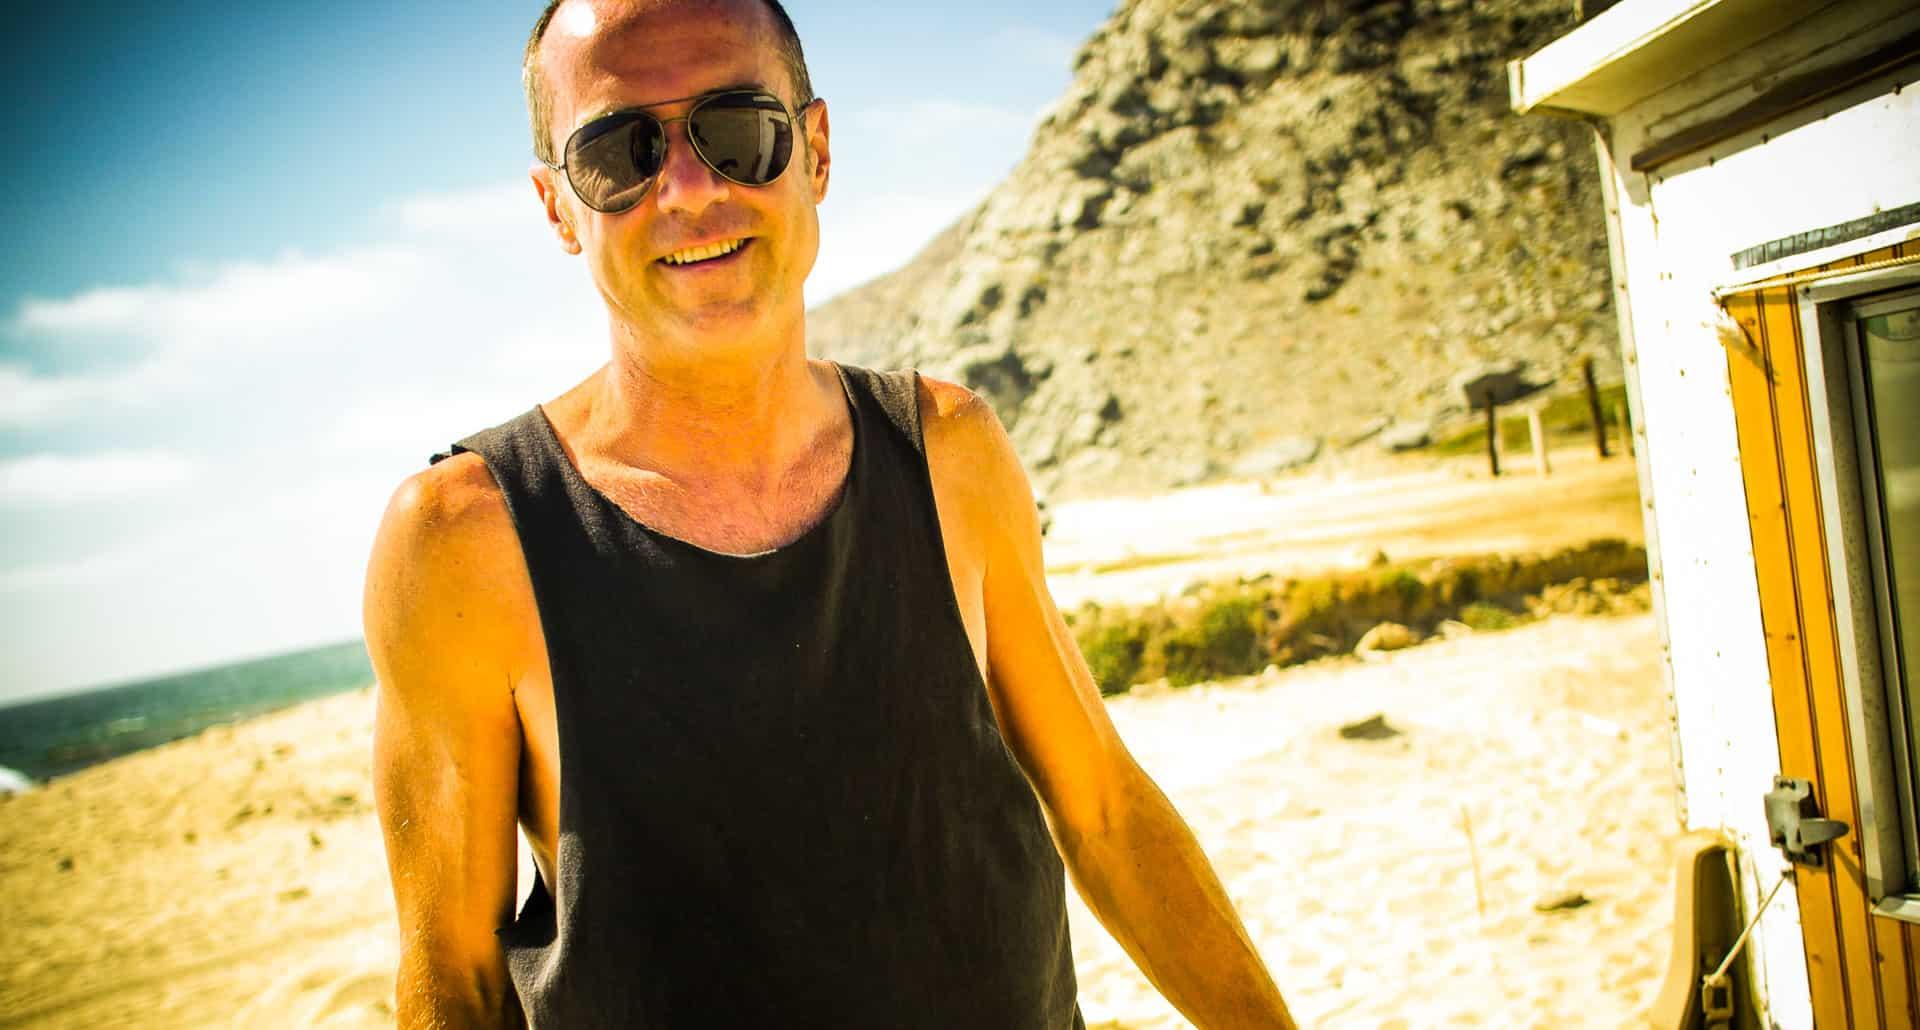 San Pedrito Beach Wandering OM